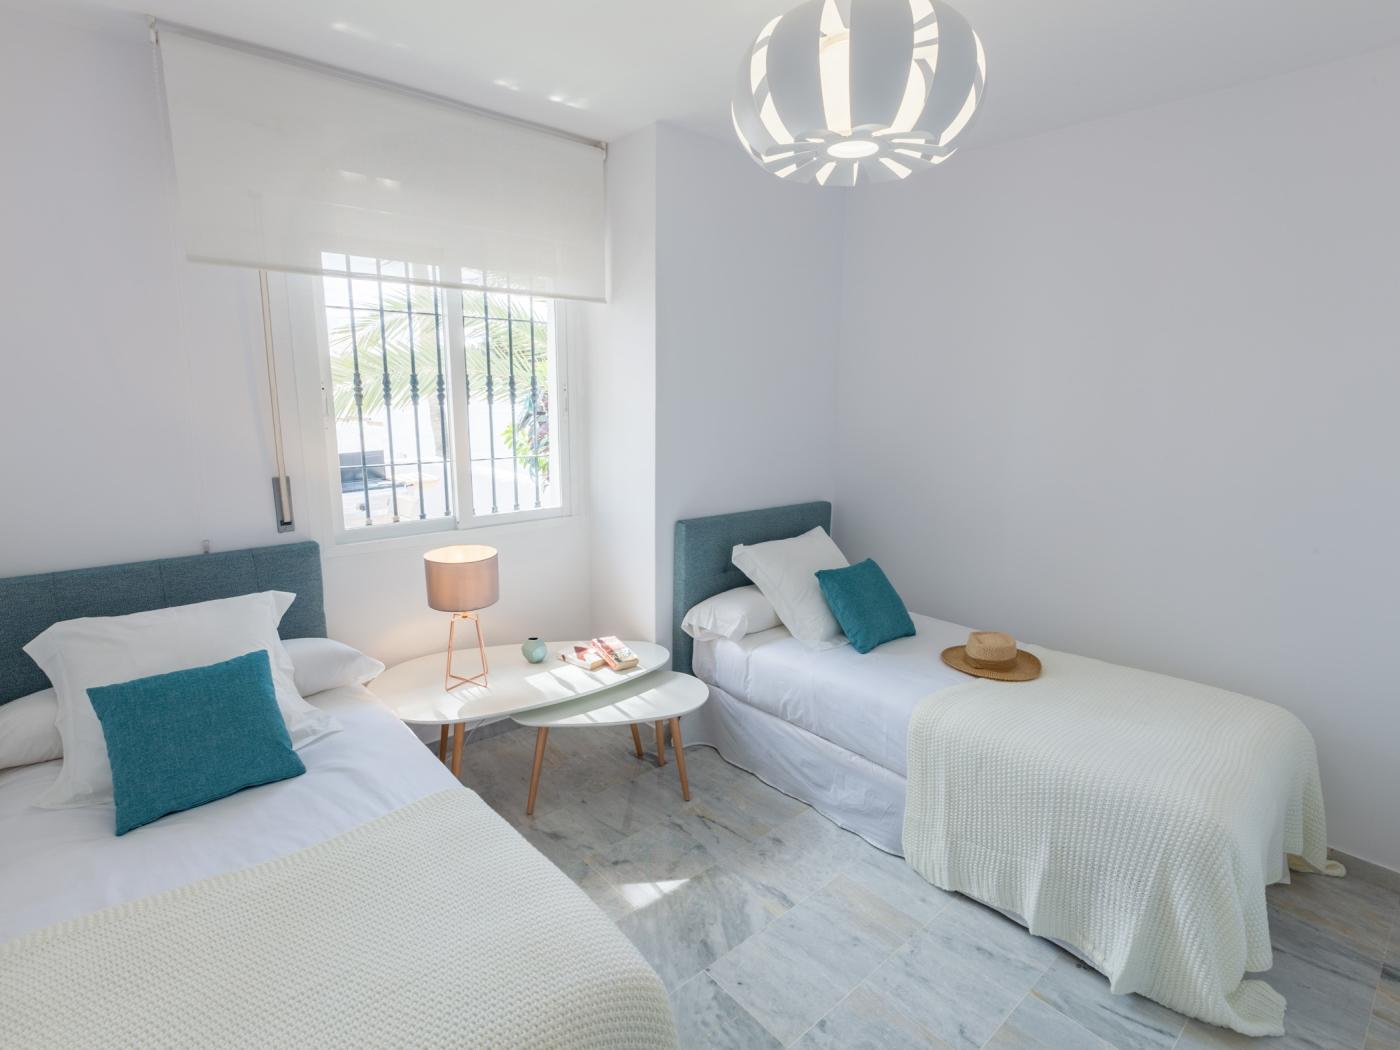 LOS NARANJOS I (3 BEDROOMS)